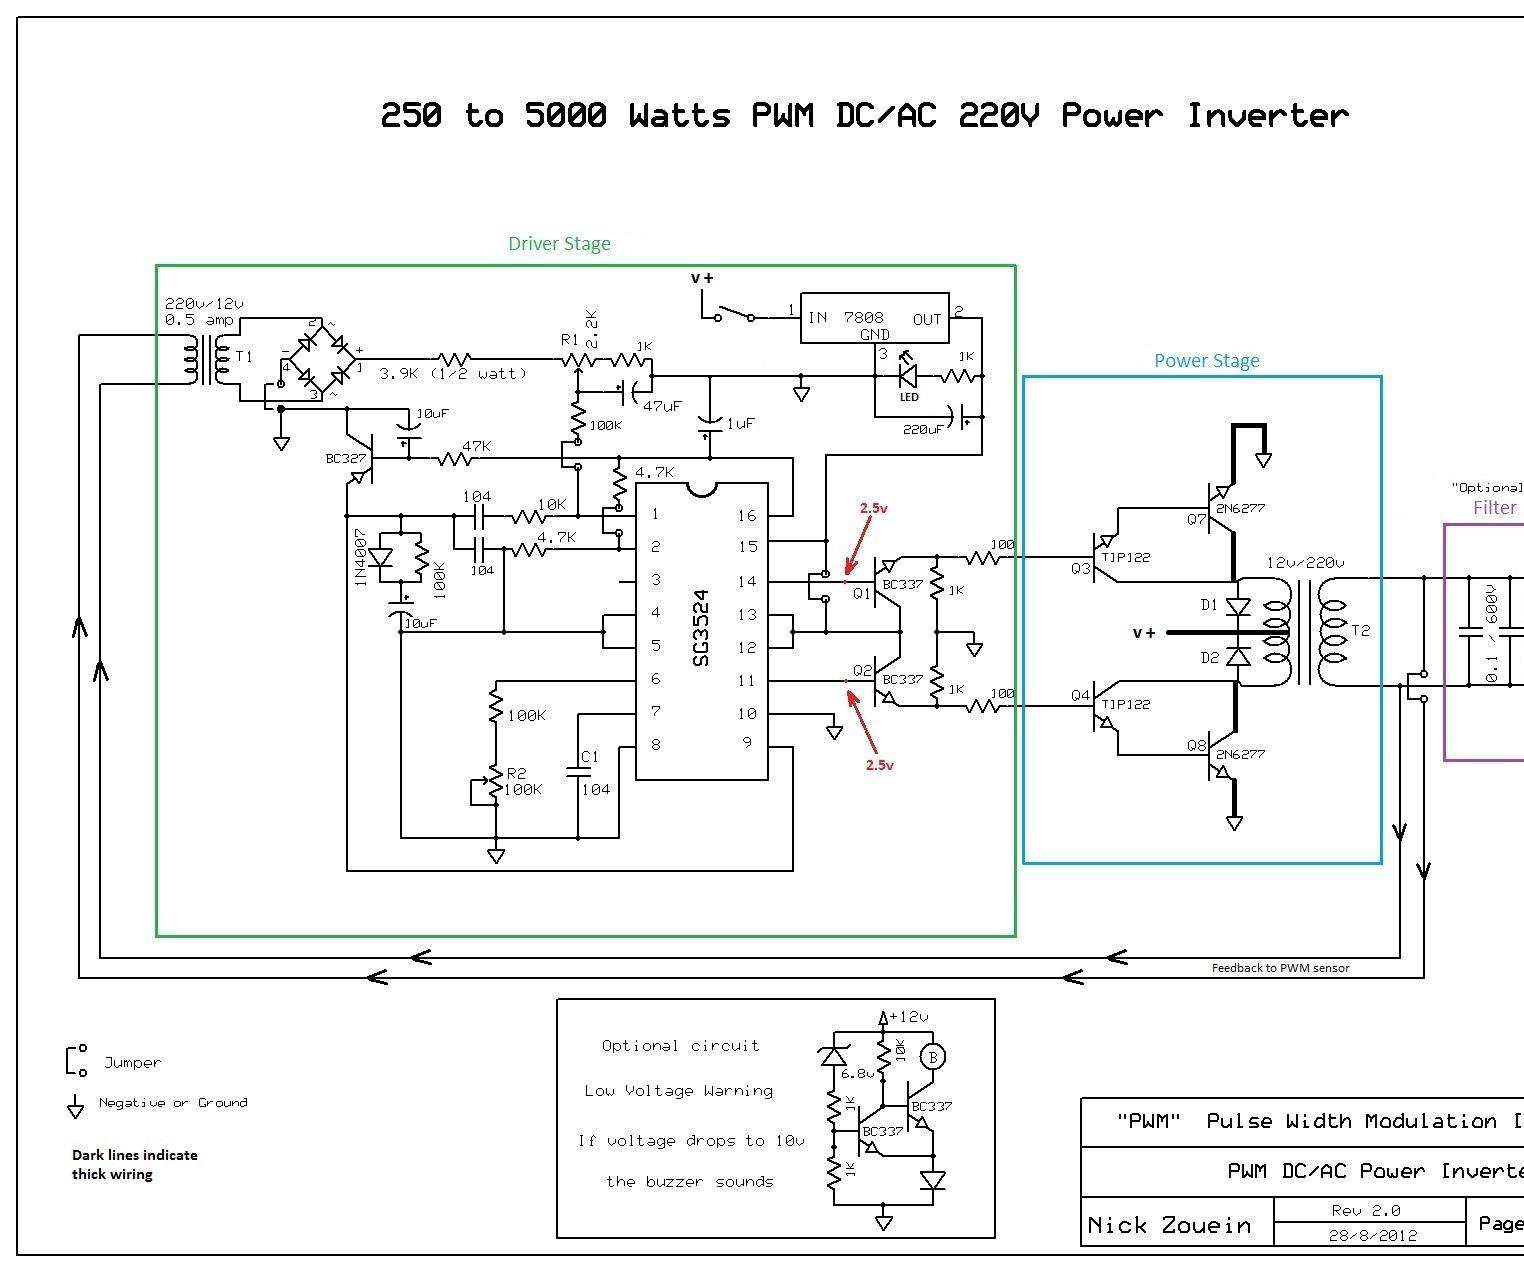 250 to 5000 watts PWM DC/AC 220V Power Inverter